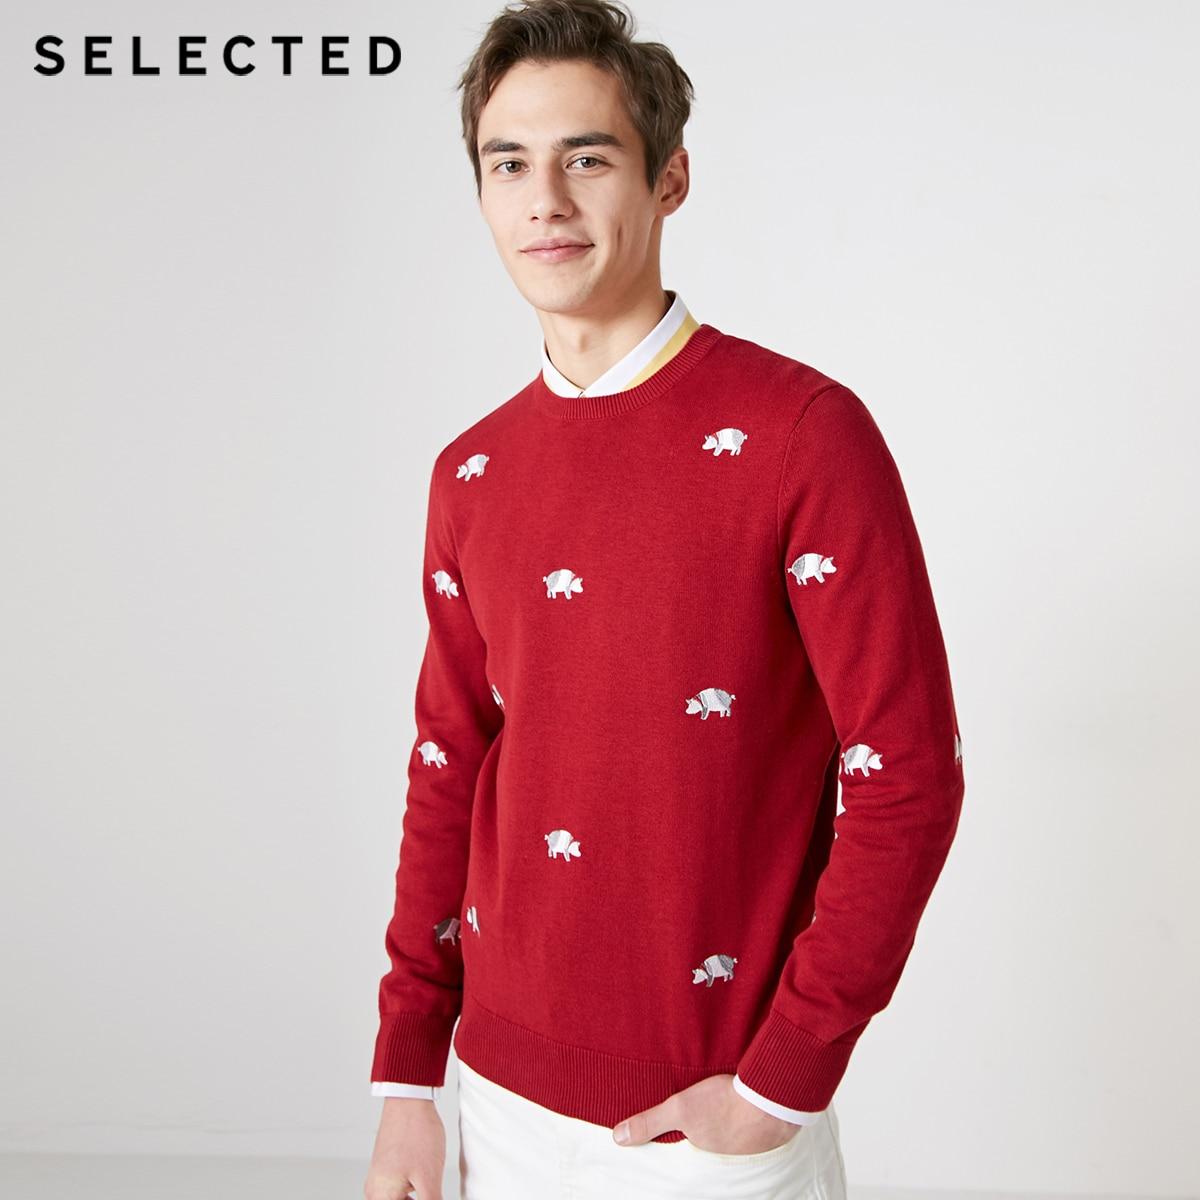 SELECTED Men's Spring Zodiac Print Casual Knit100% Cotton S|419124551